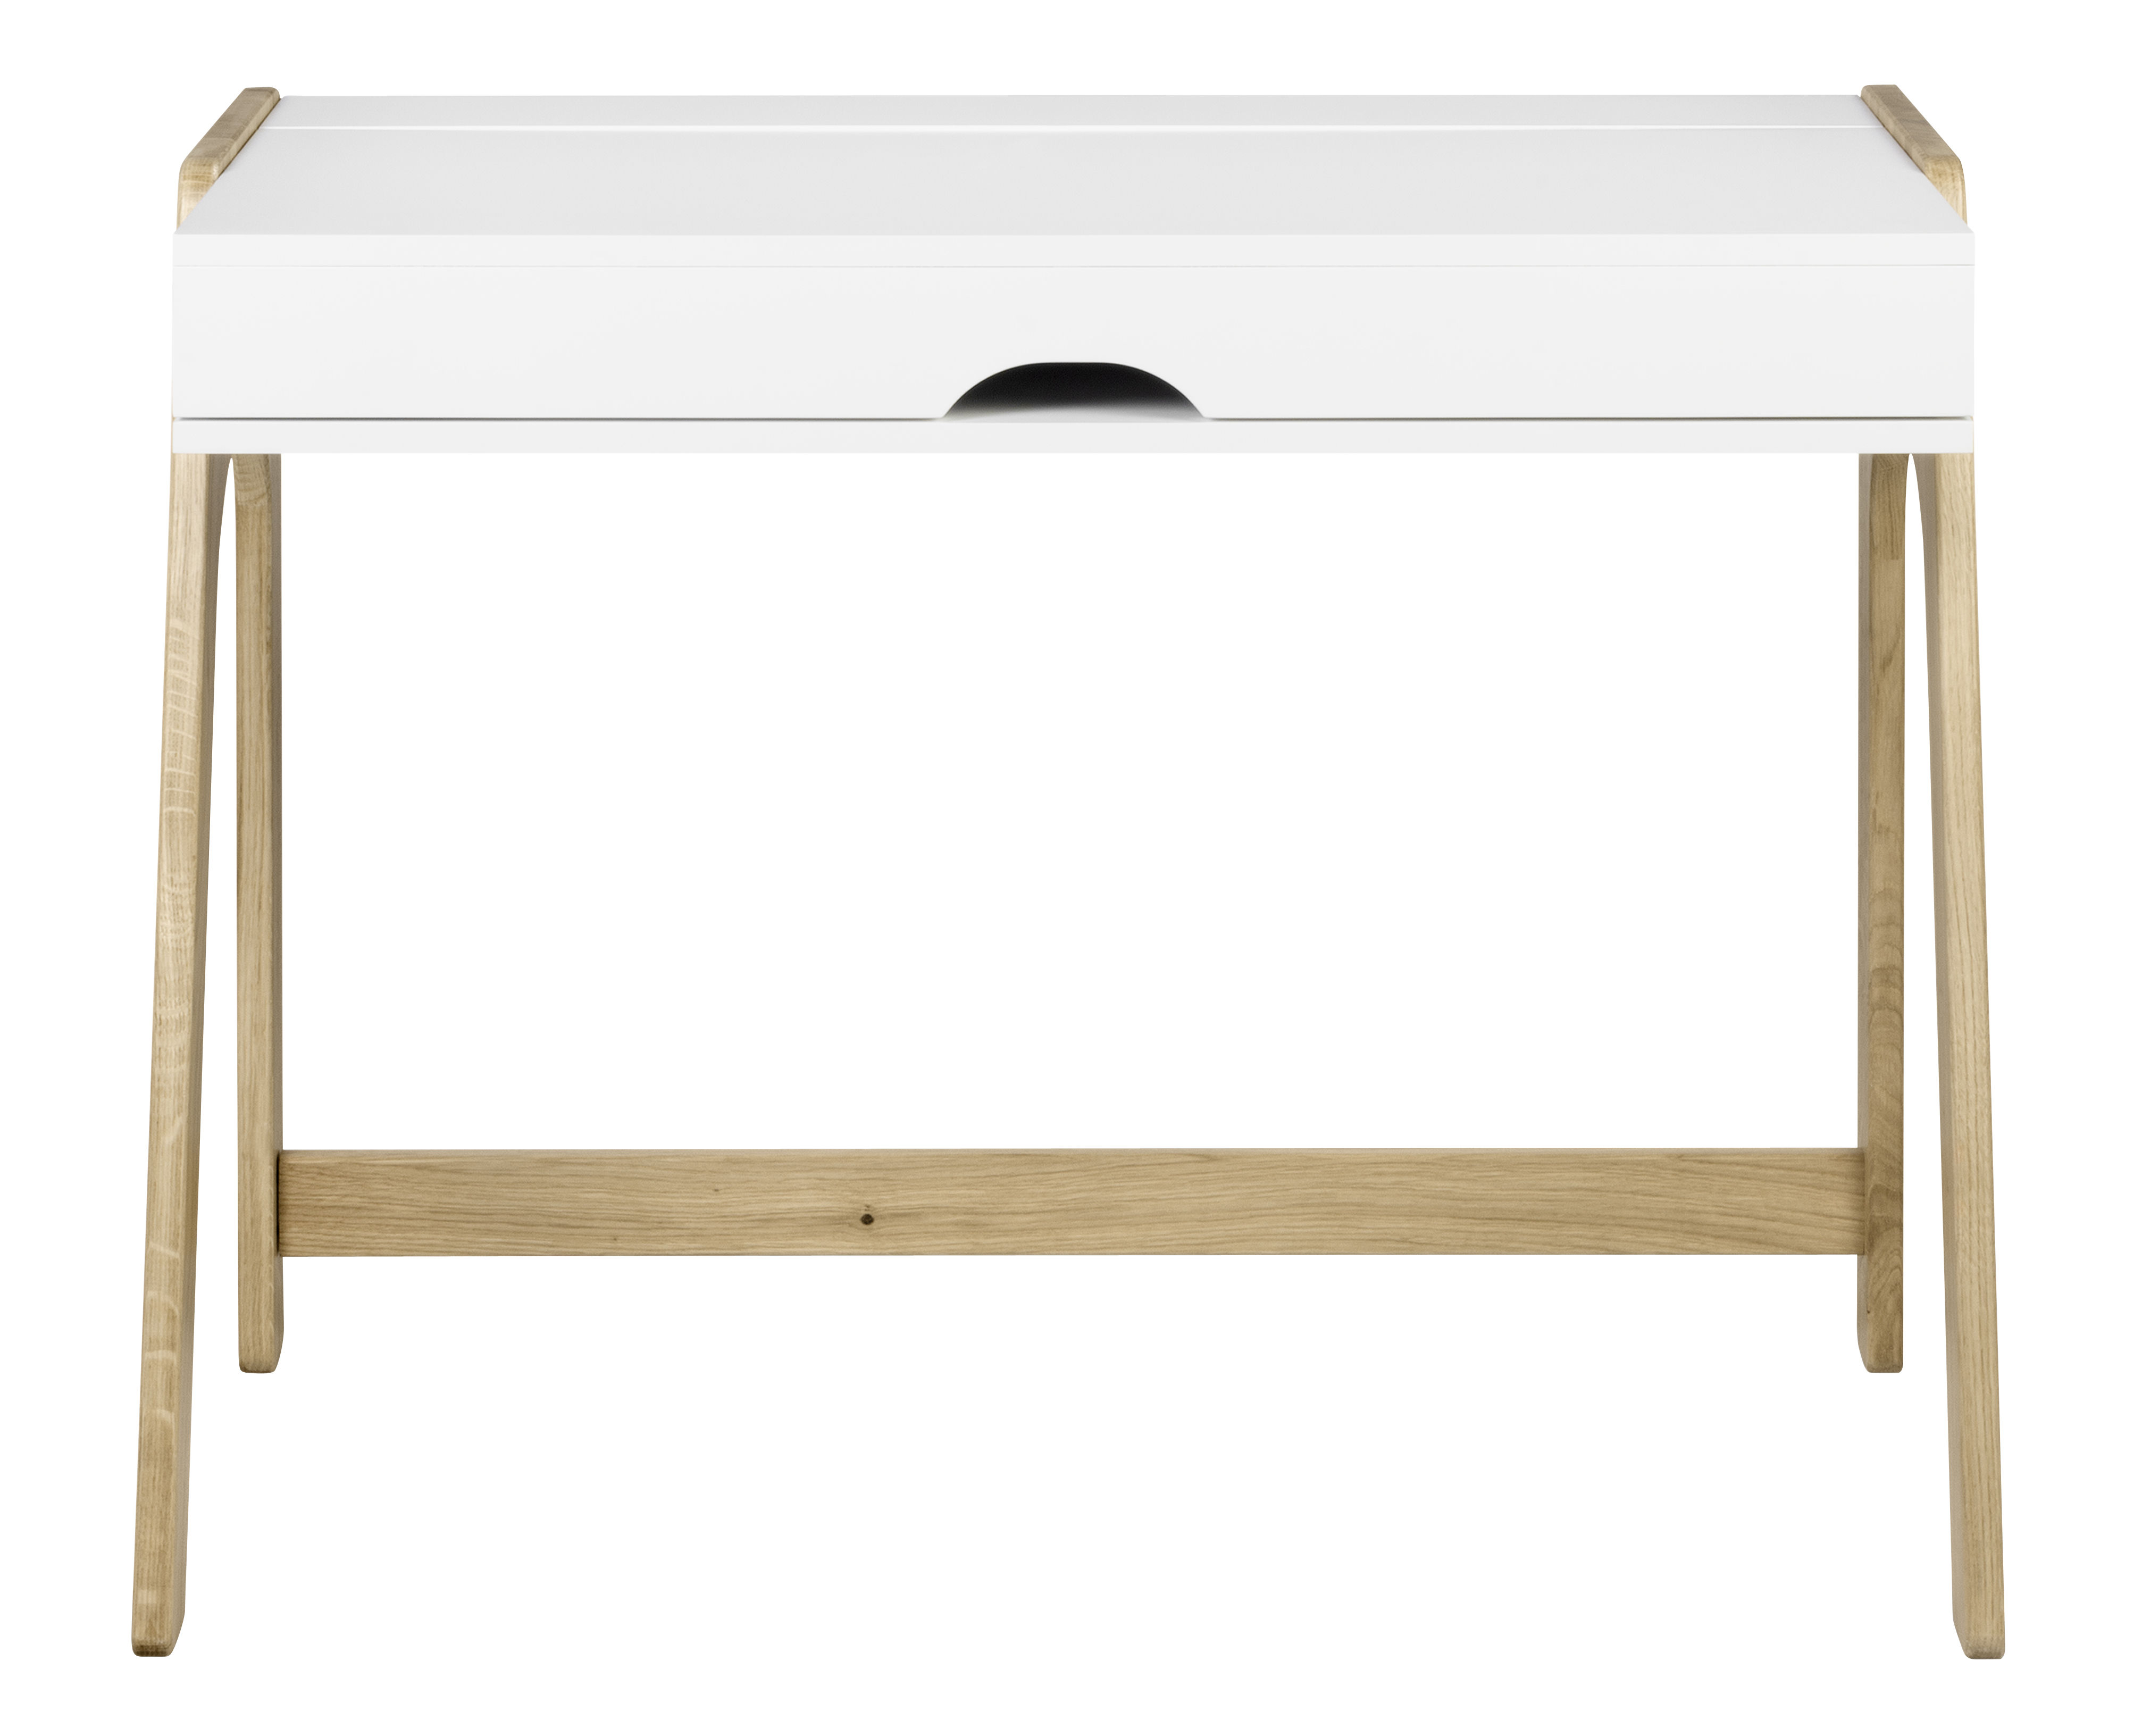 Furniture - Office Furniture - Willbe Desk - / Writing desk - Fold-away top by POP UP HOME - White / Oak - Painted chipboard, Solid oak